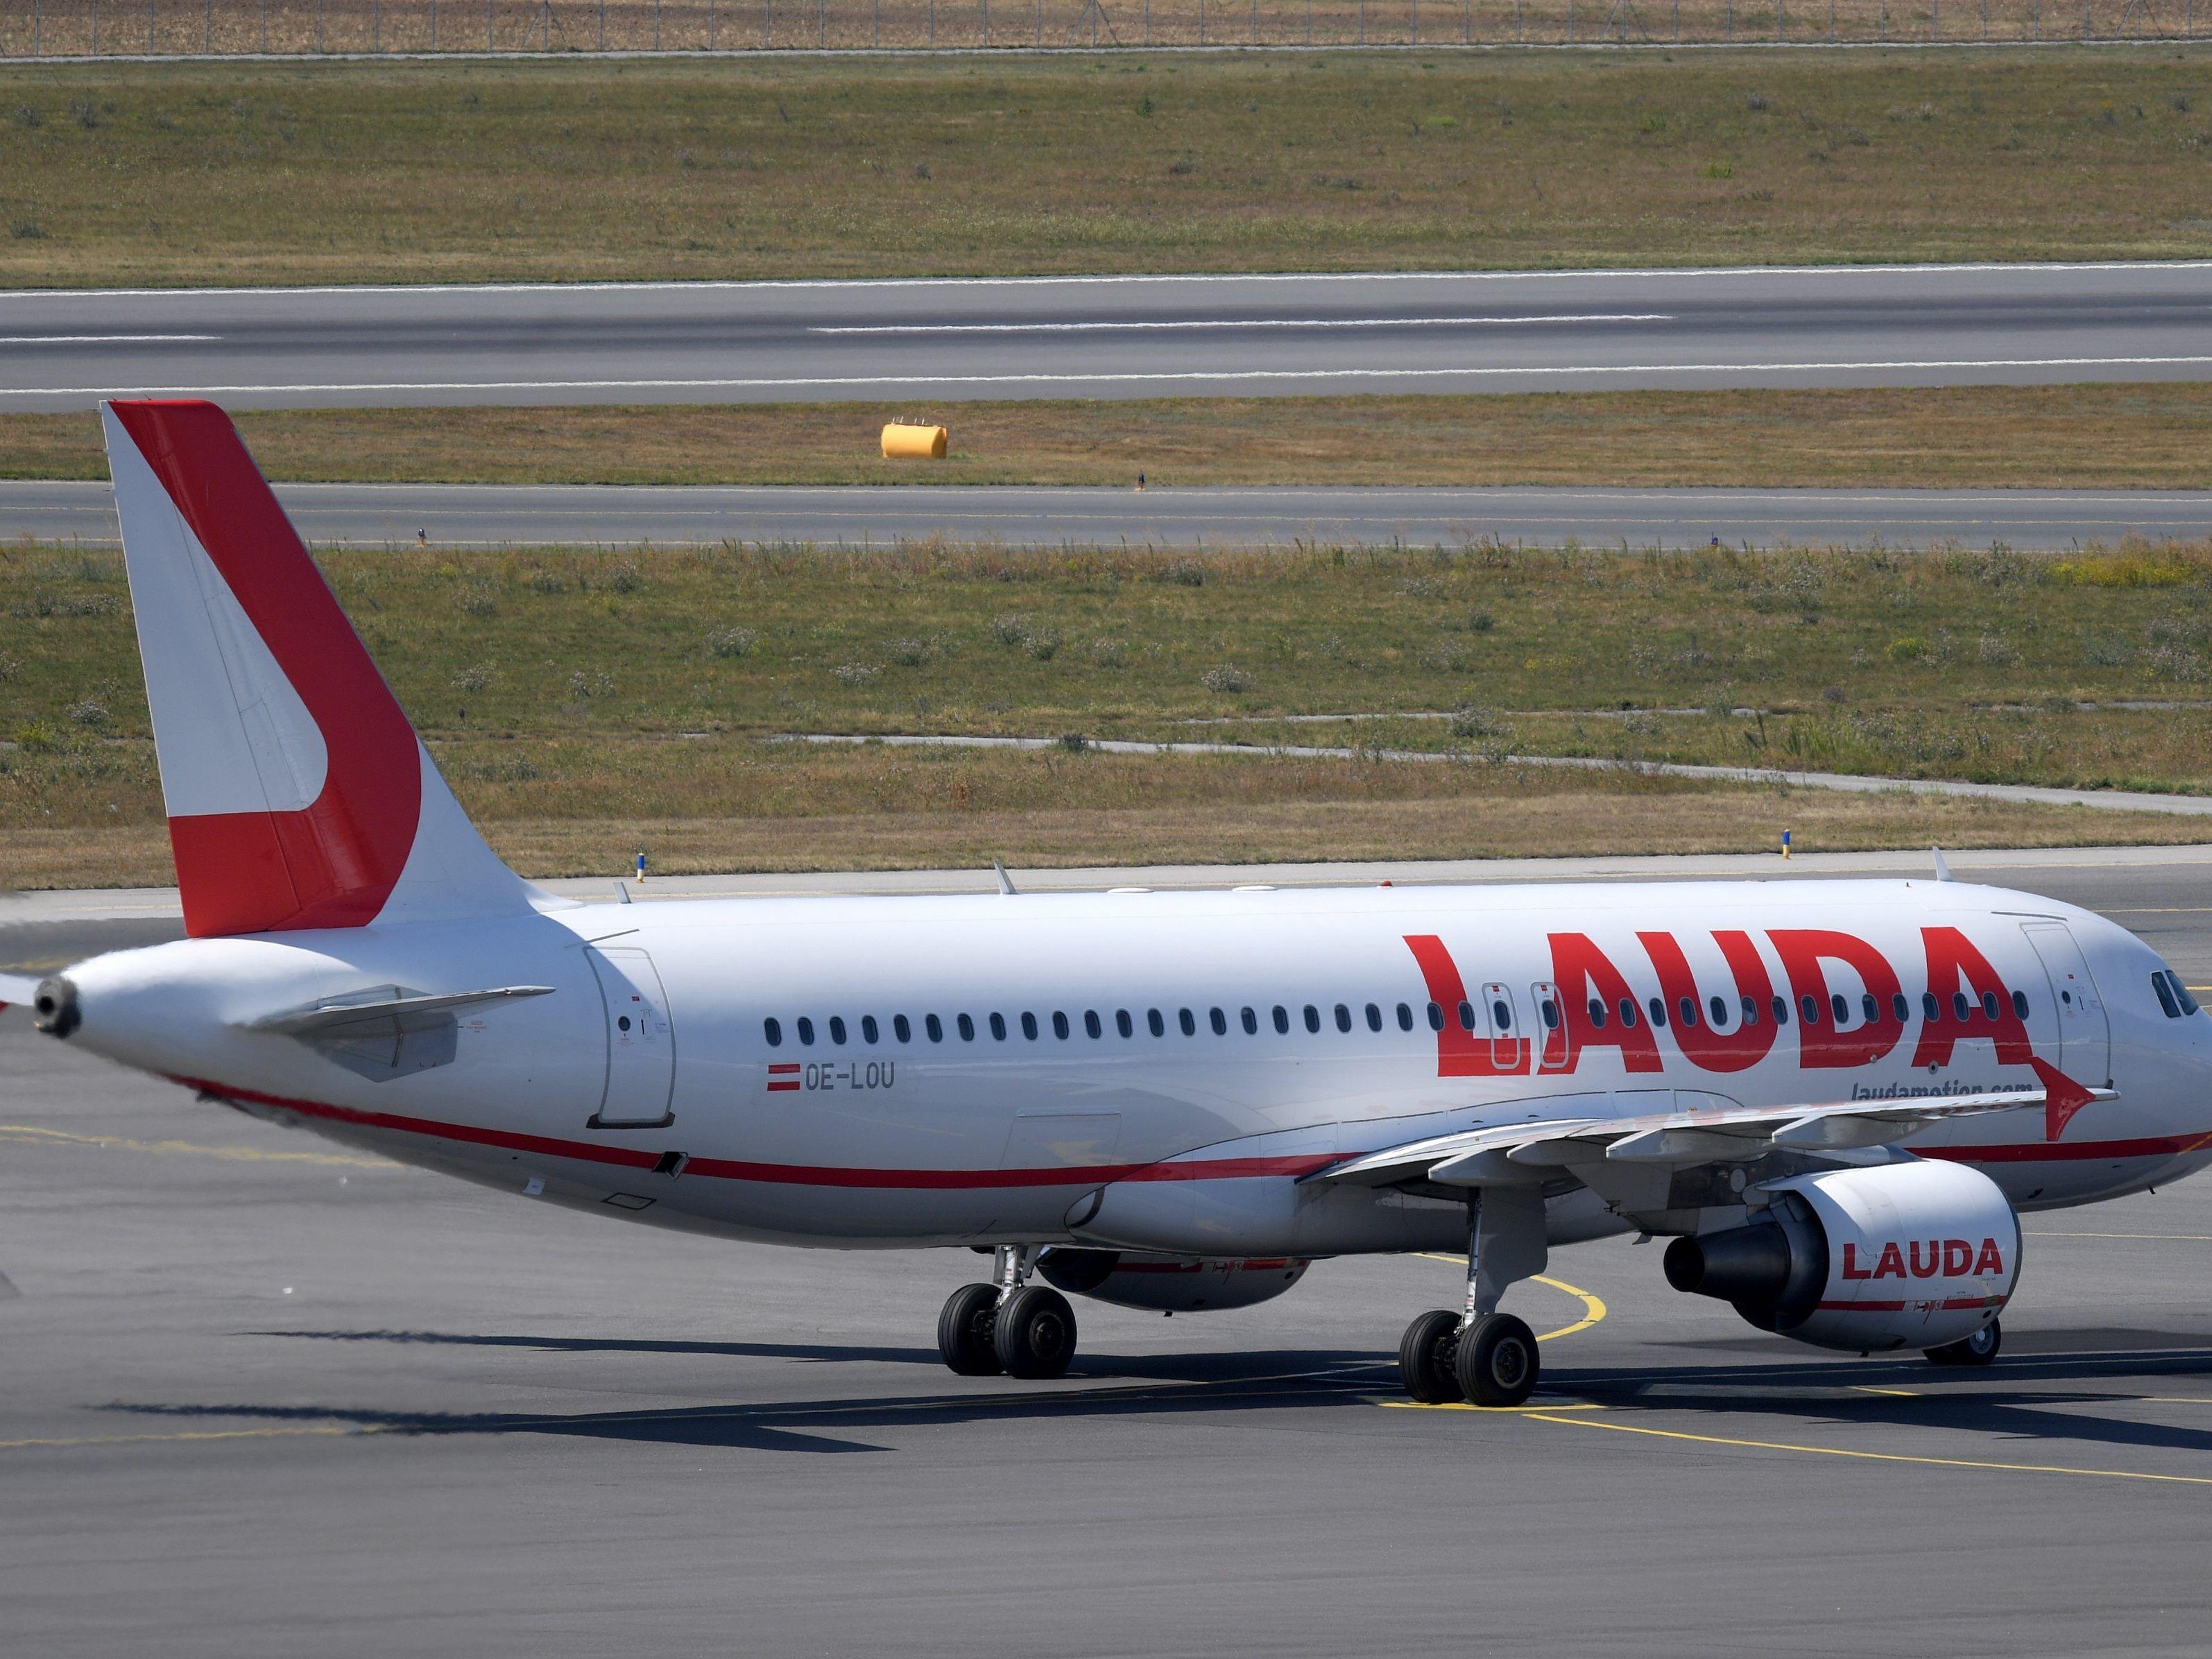 Laudamotion: AMS wies Massenkündigung ab